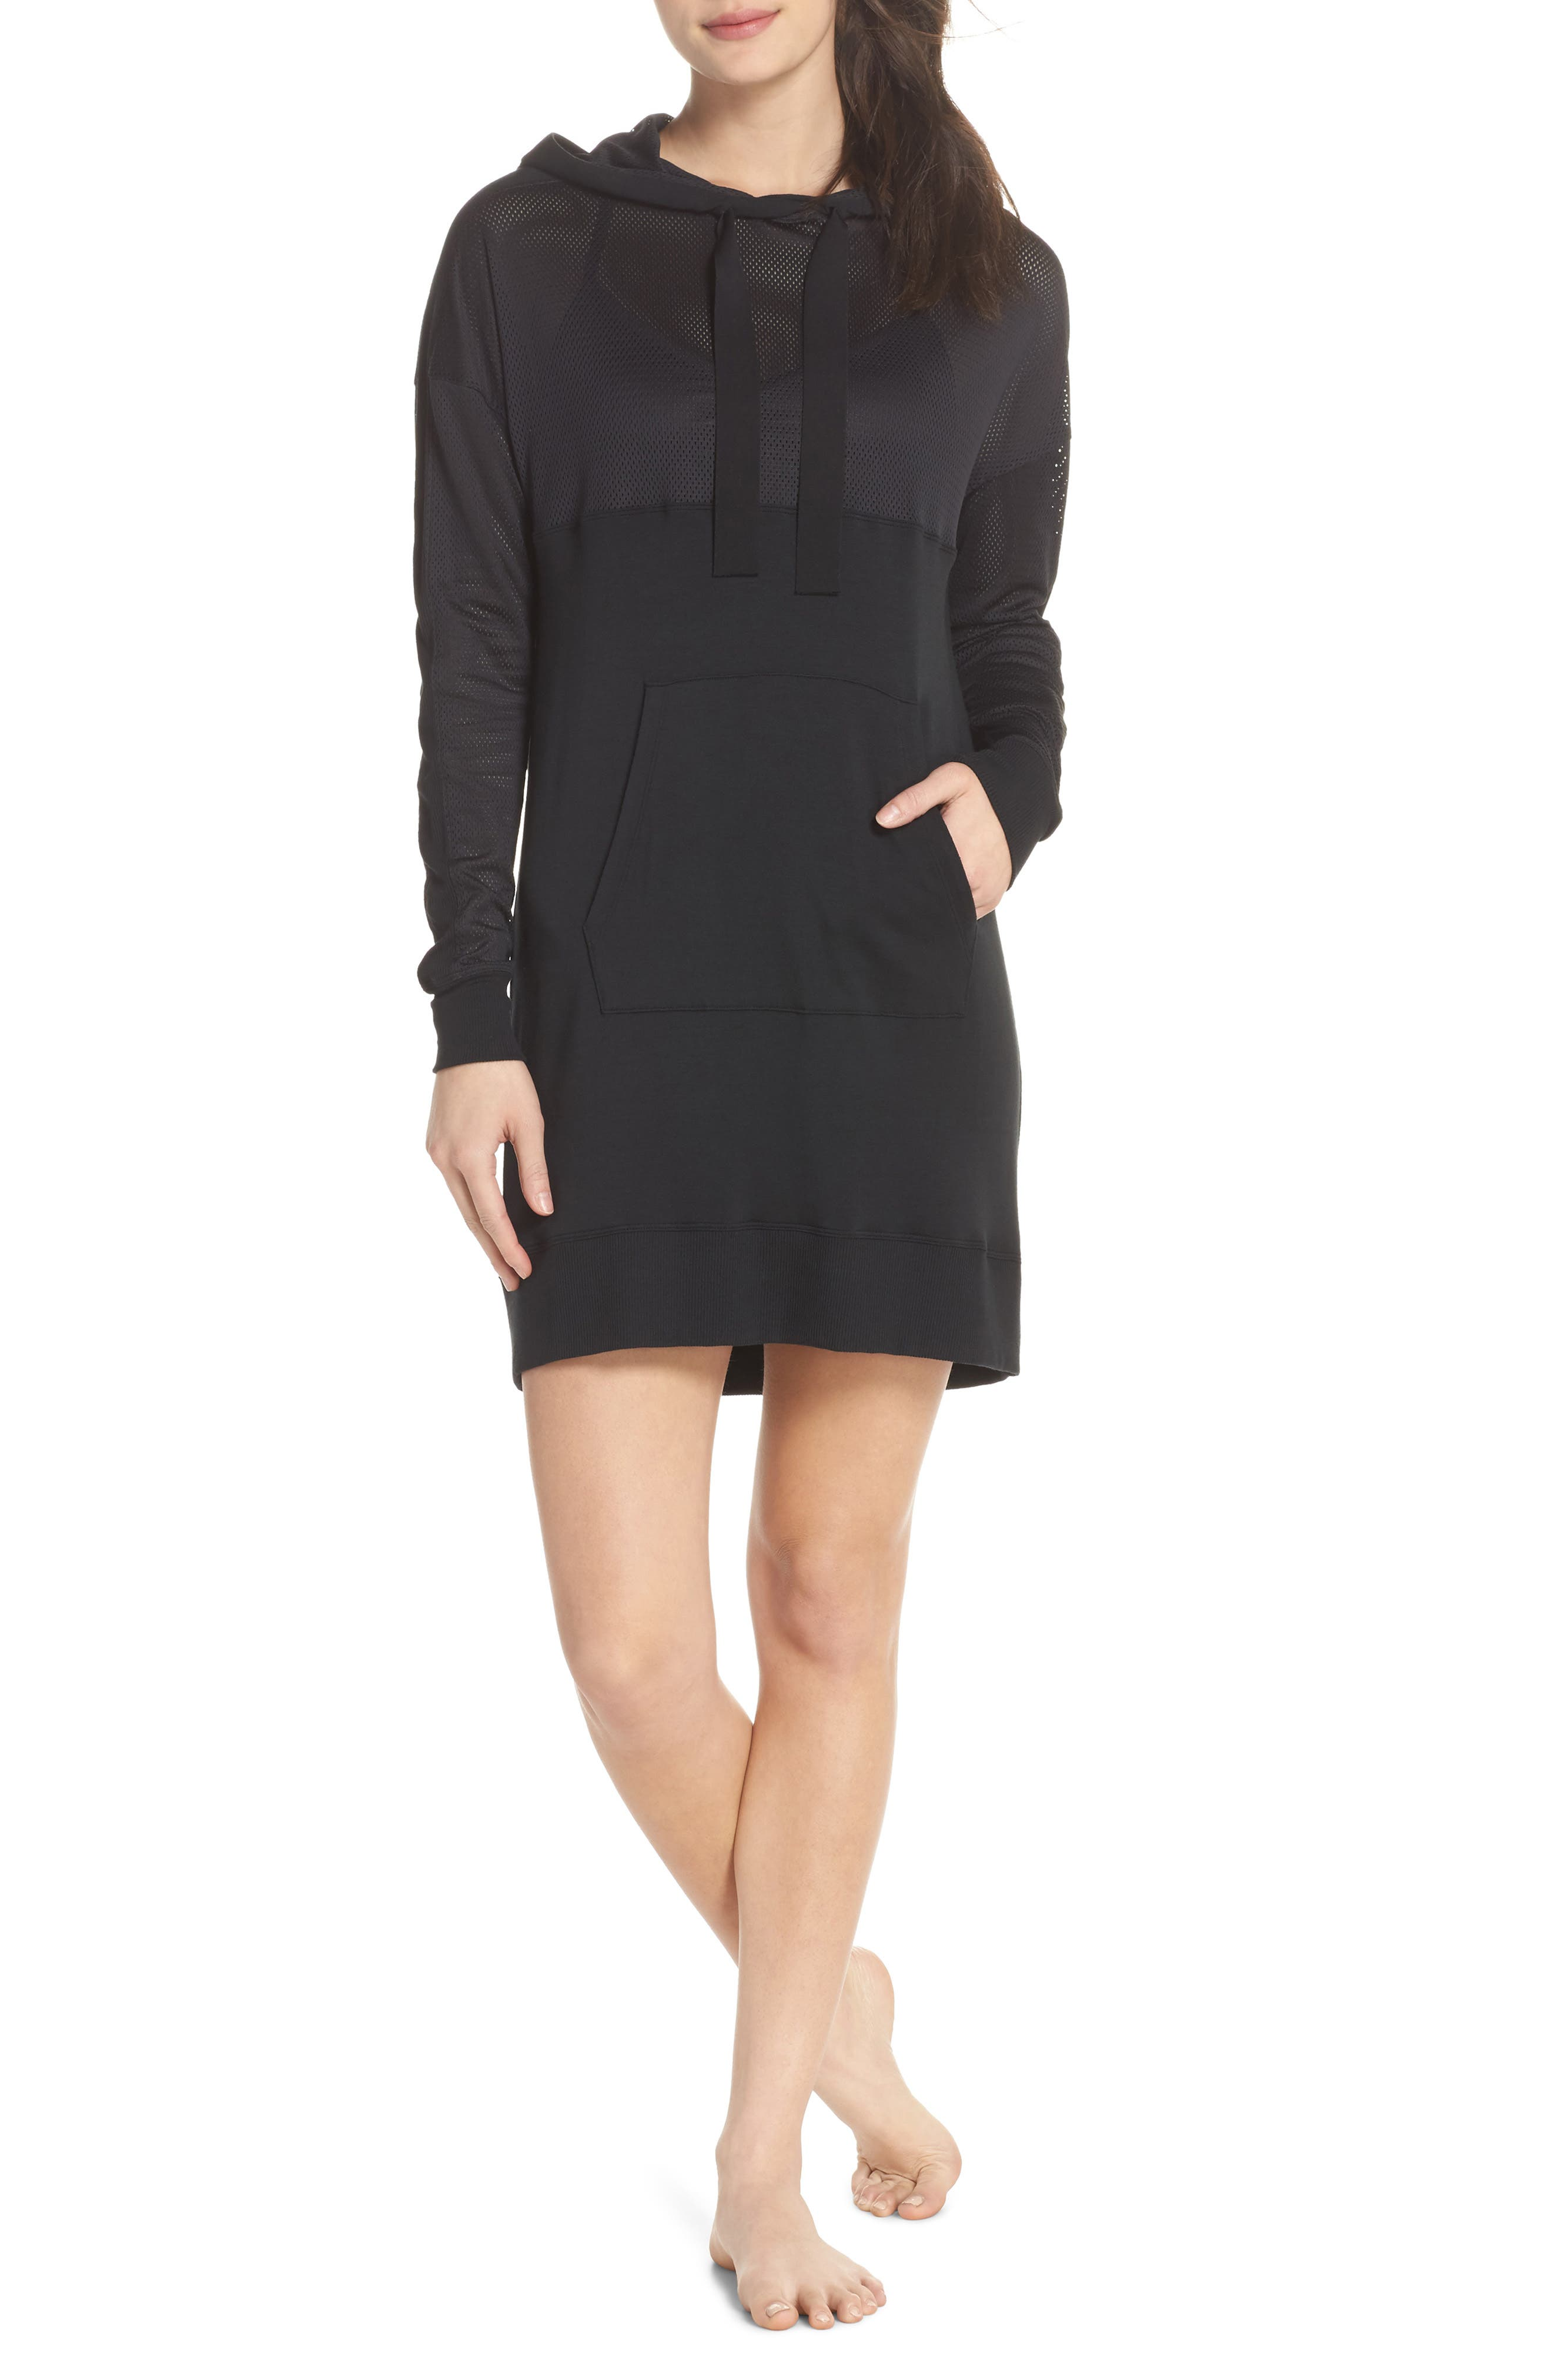 Range Dress,                             Main thumbnail 1, color,                             001